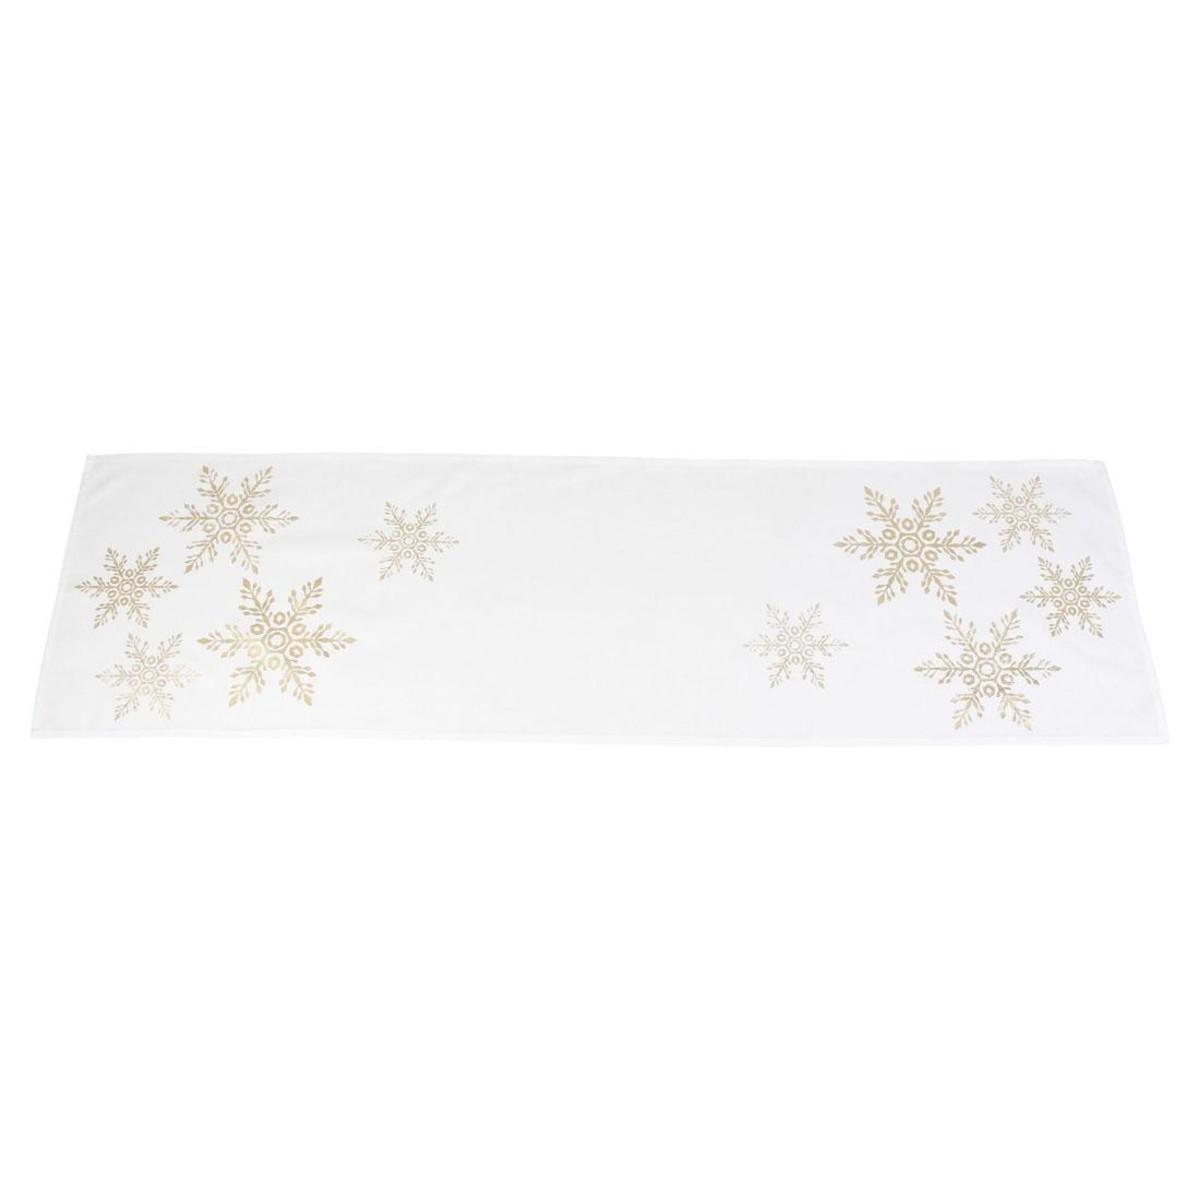 Дорожка на стол Хит-декор Золотой снег 07723 140х40 см